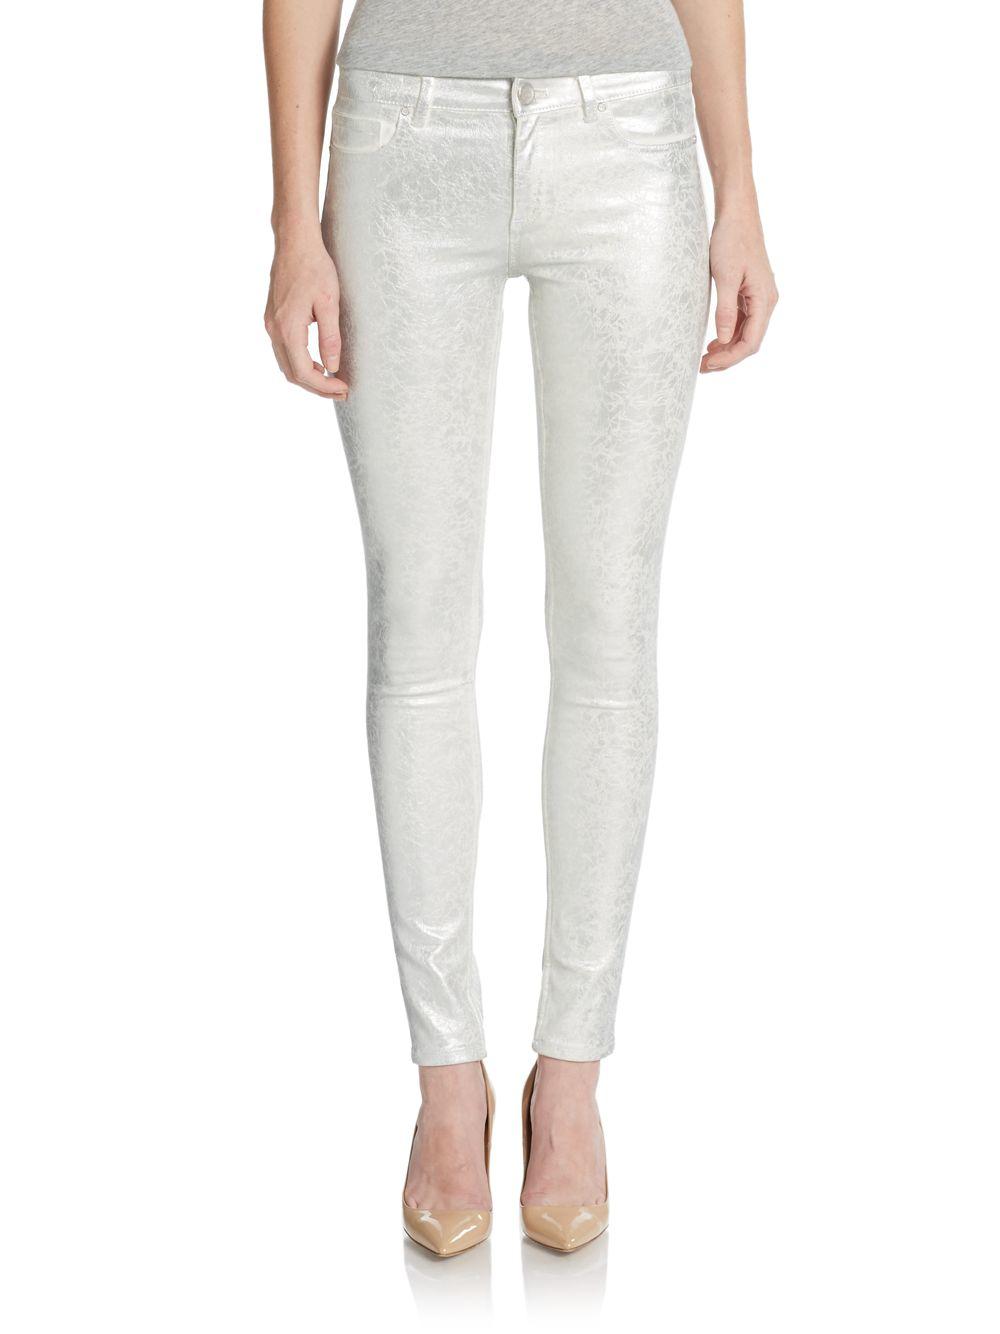 Elie tahari Azella Coated Metallic Skinny Jeans in White   Lyst